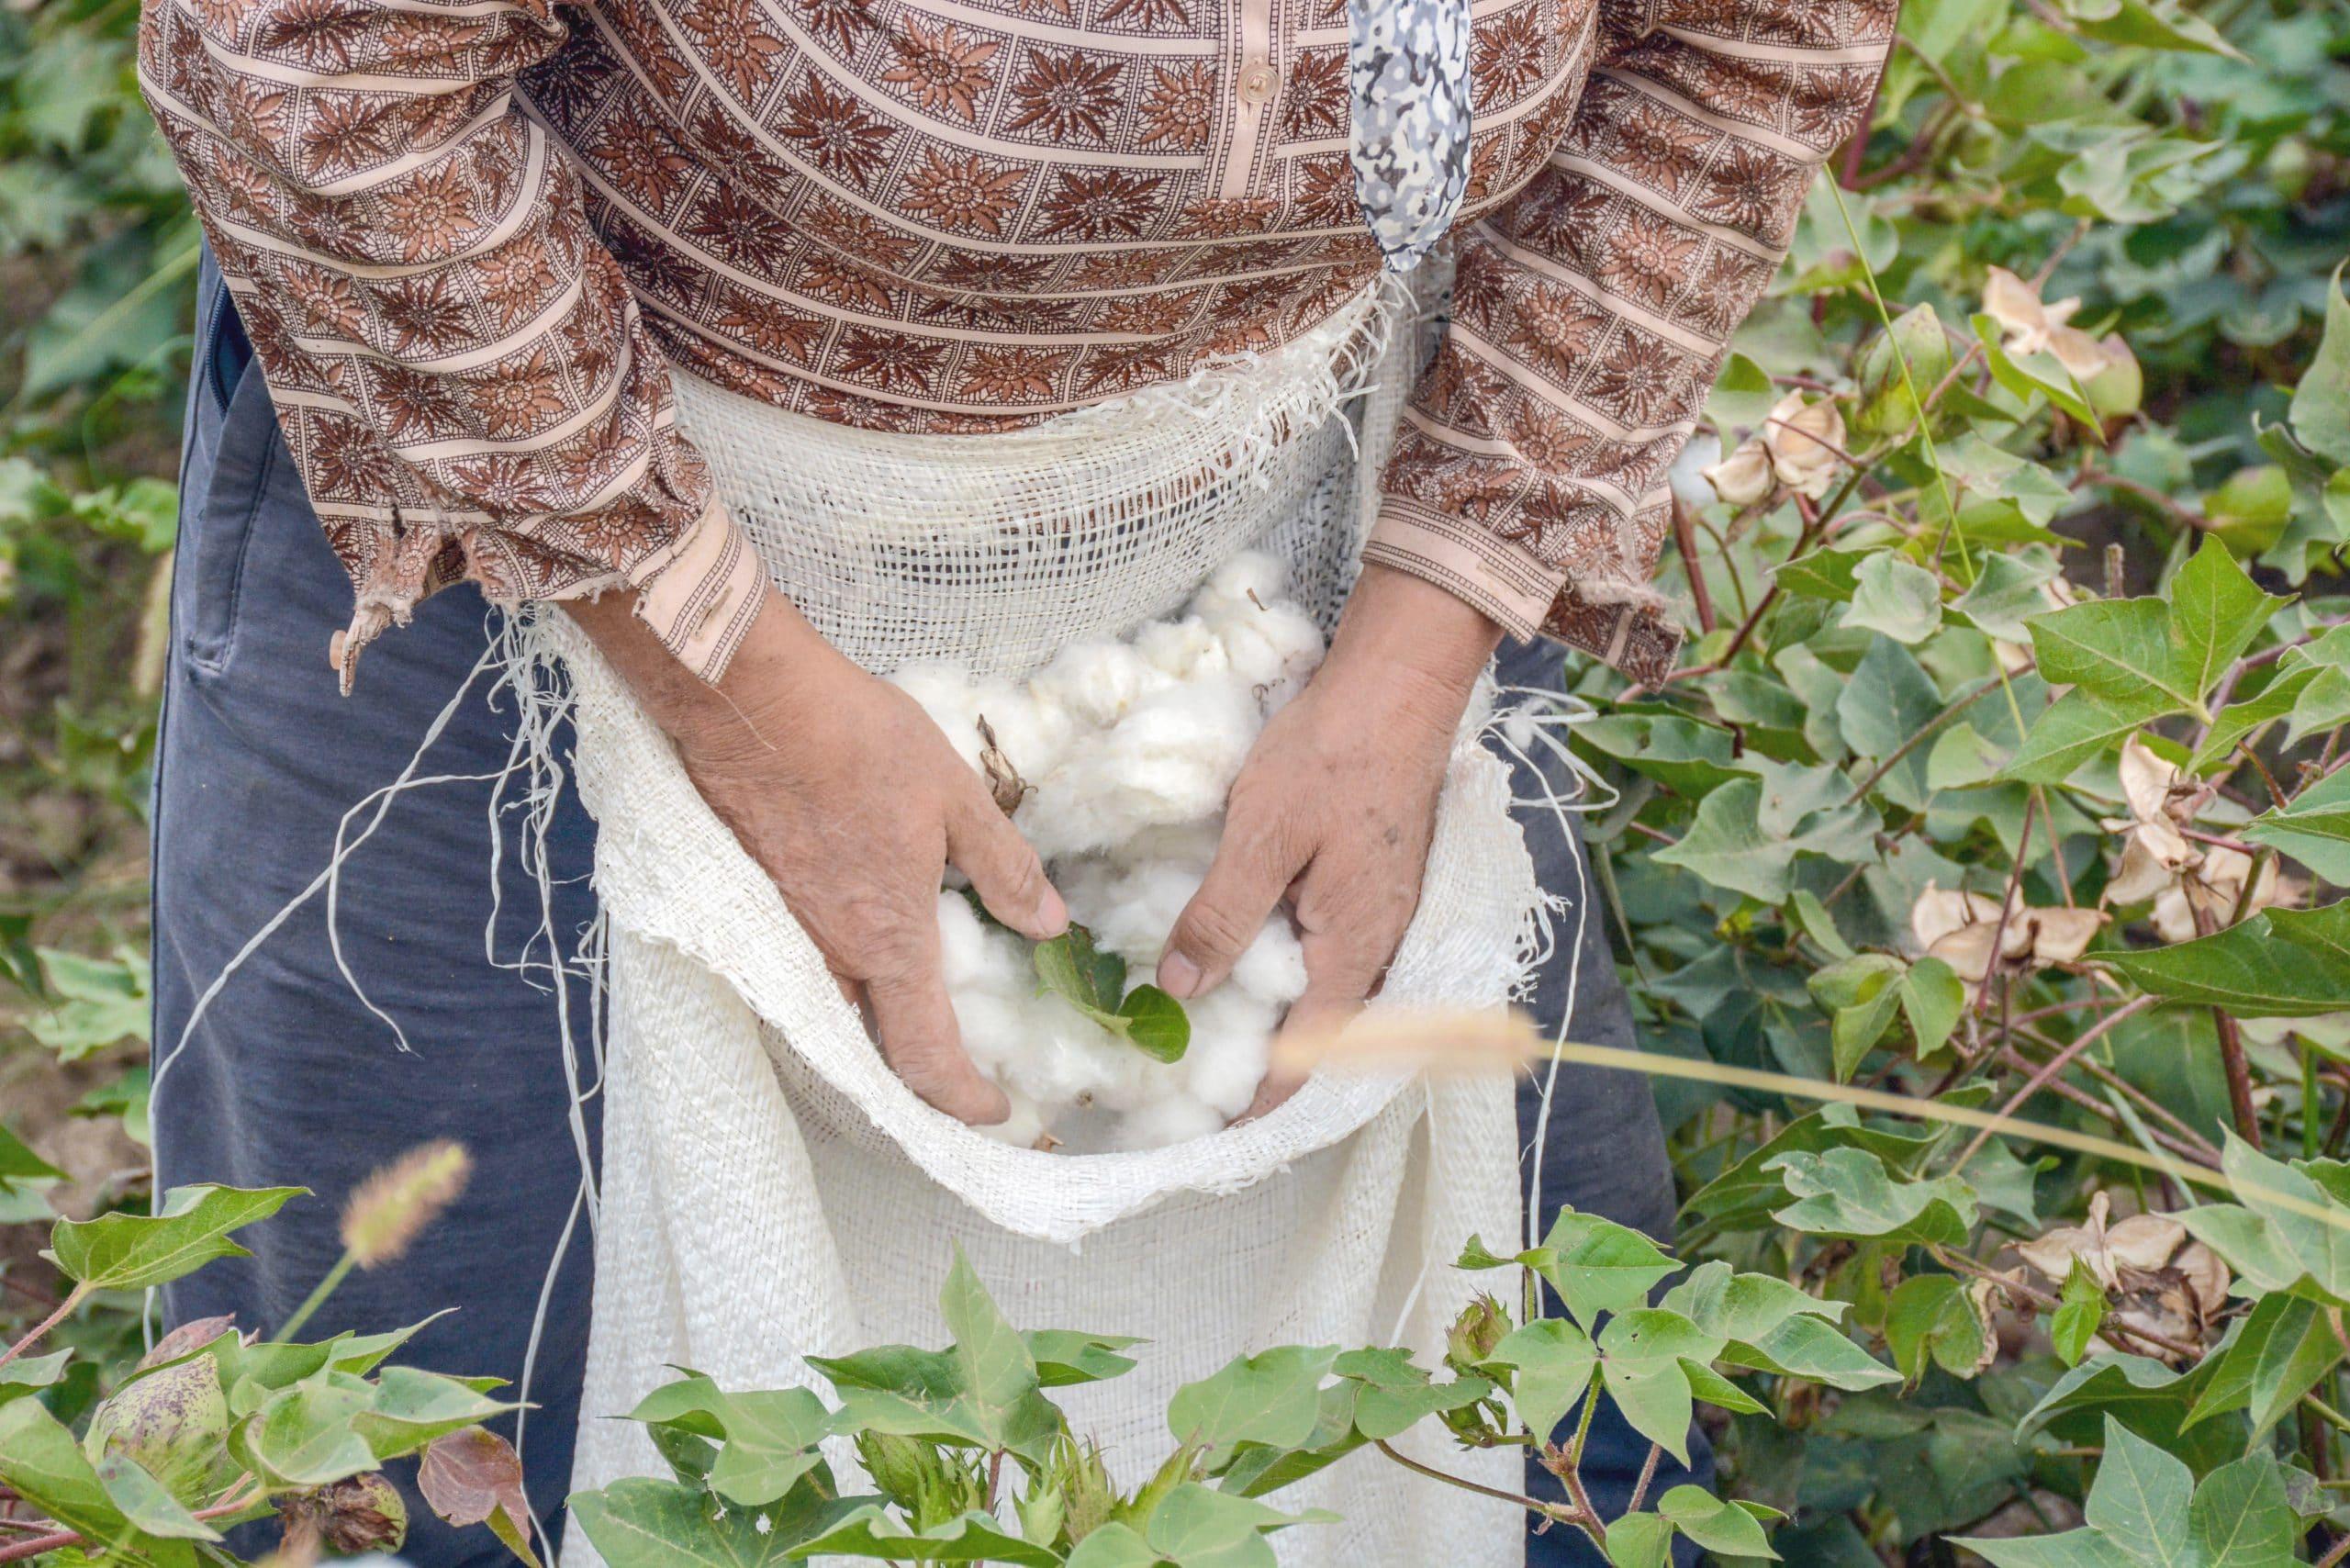 Lady picking organic cotton